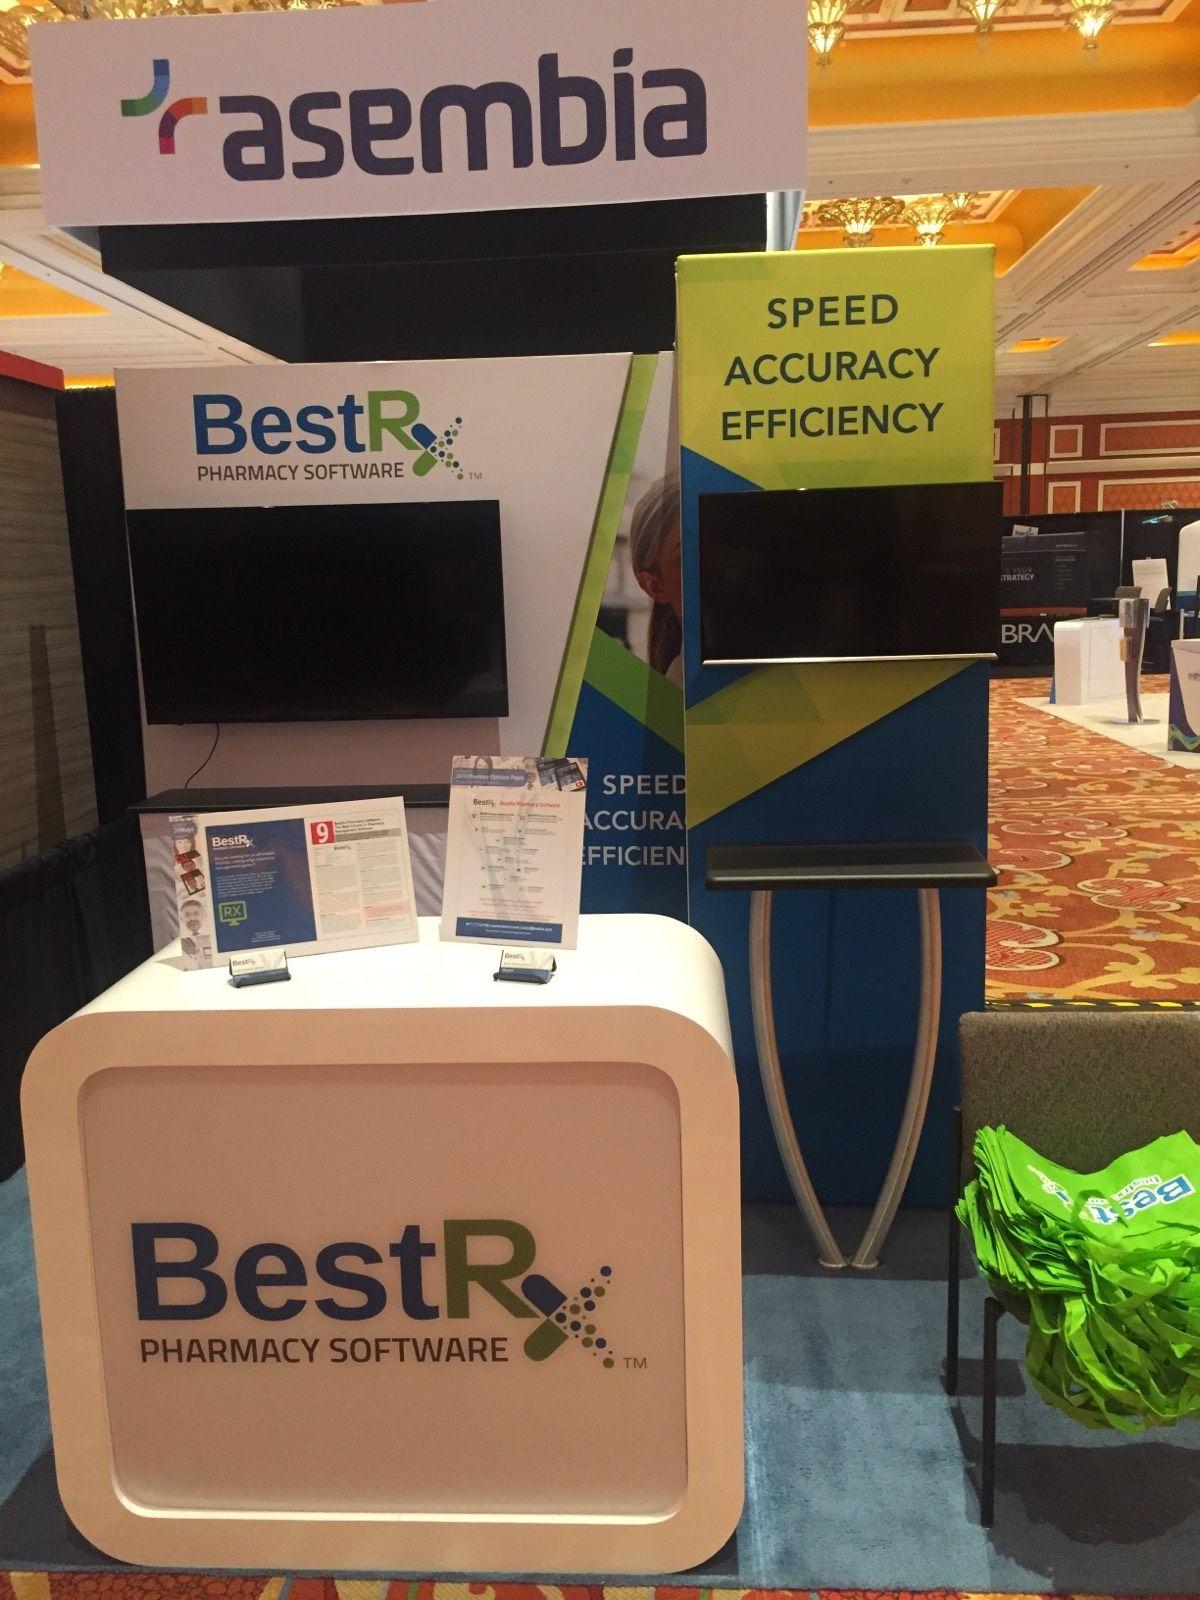 Bestrx asembias annual specialty pharmacy summit will